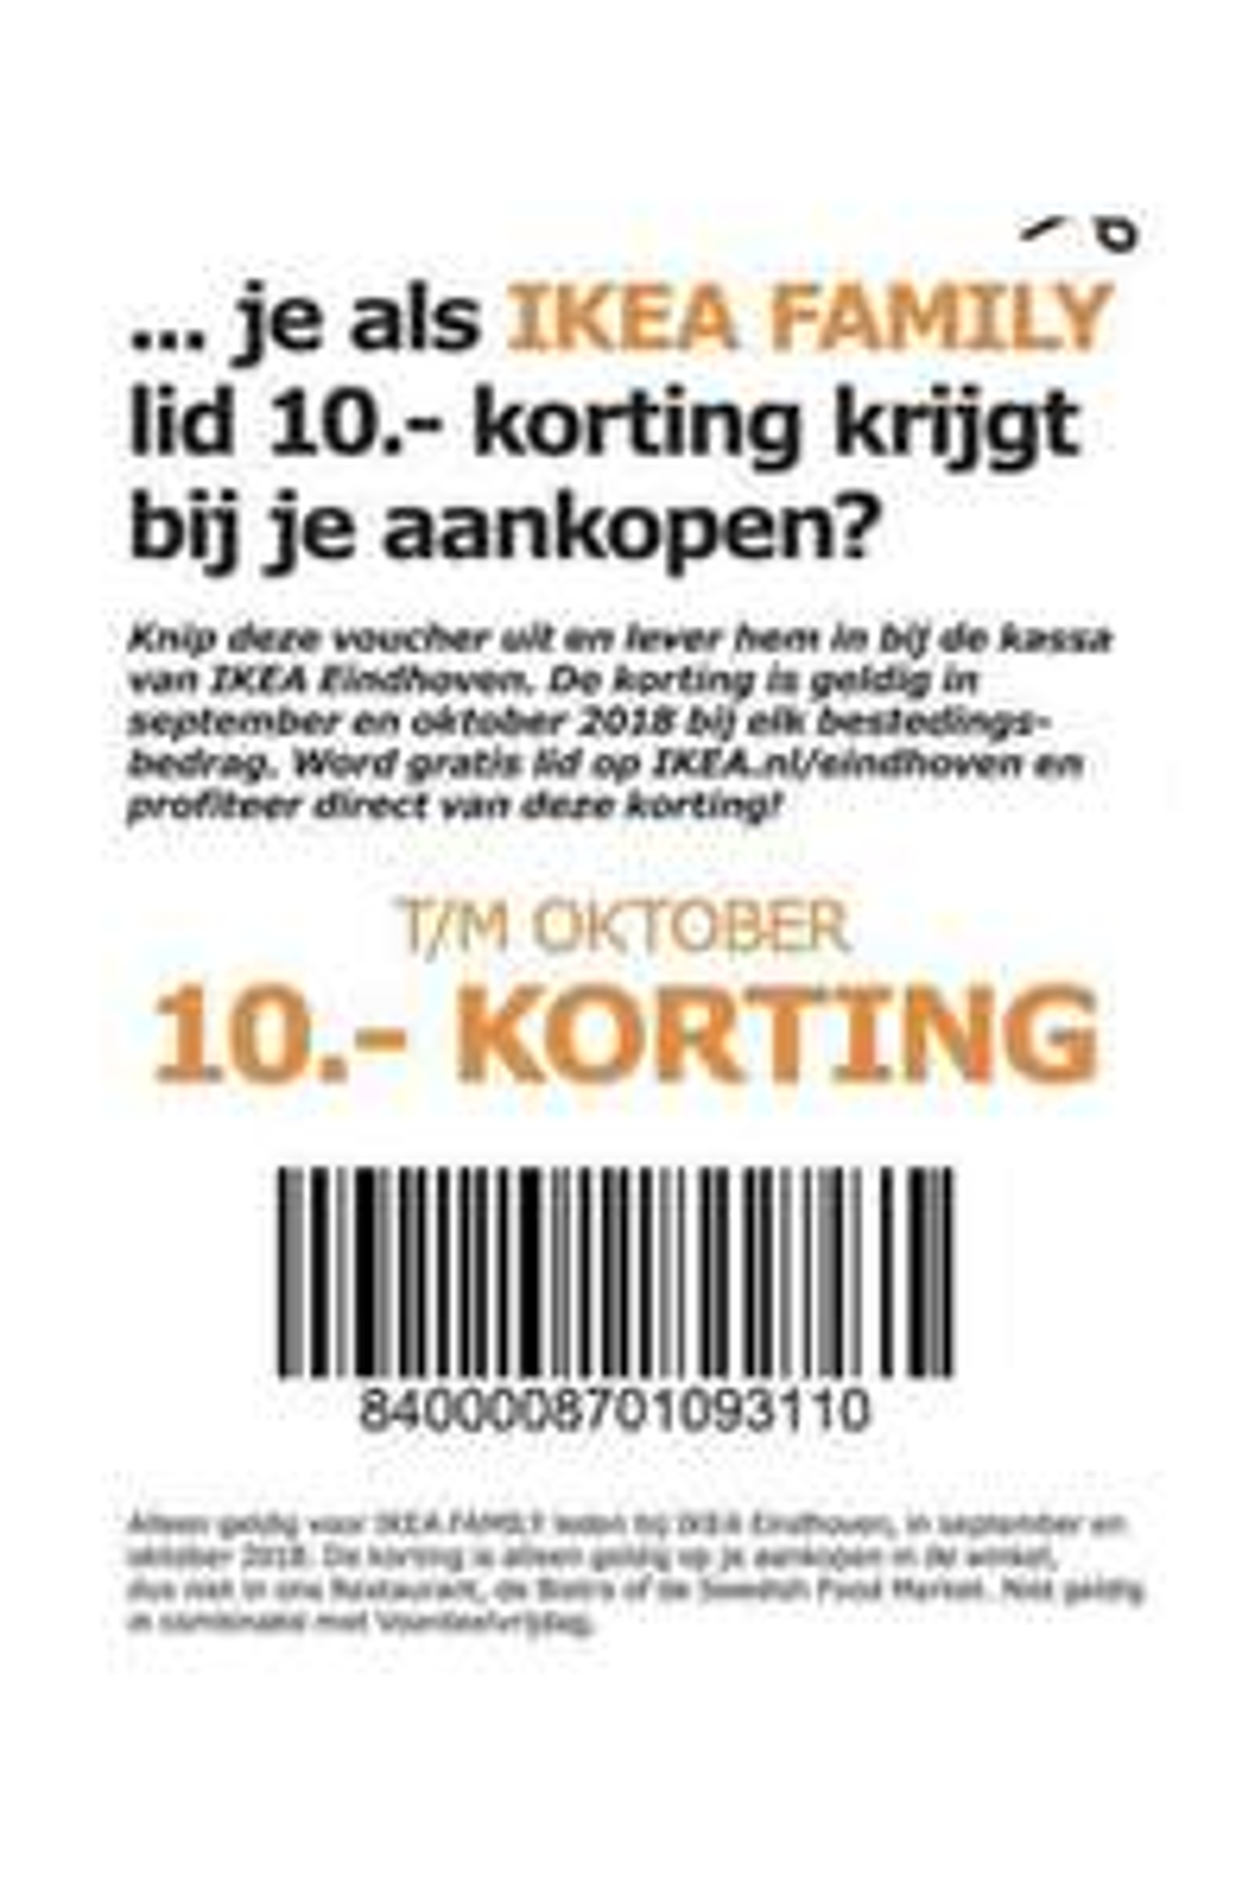 10 euro korting zonder minimum besteding bij IKEA Eindhoven